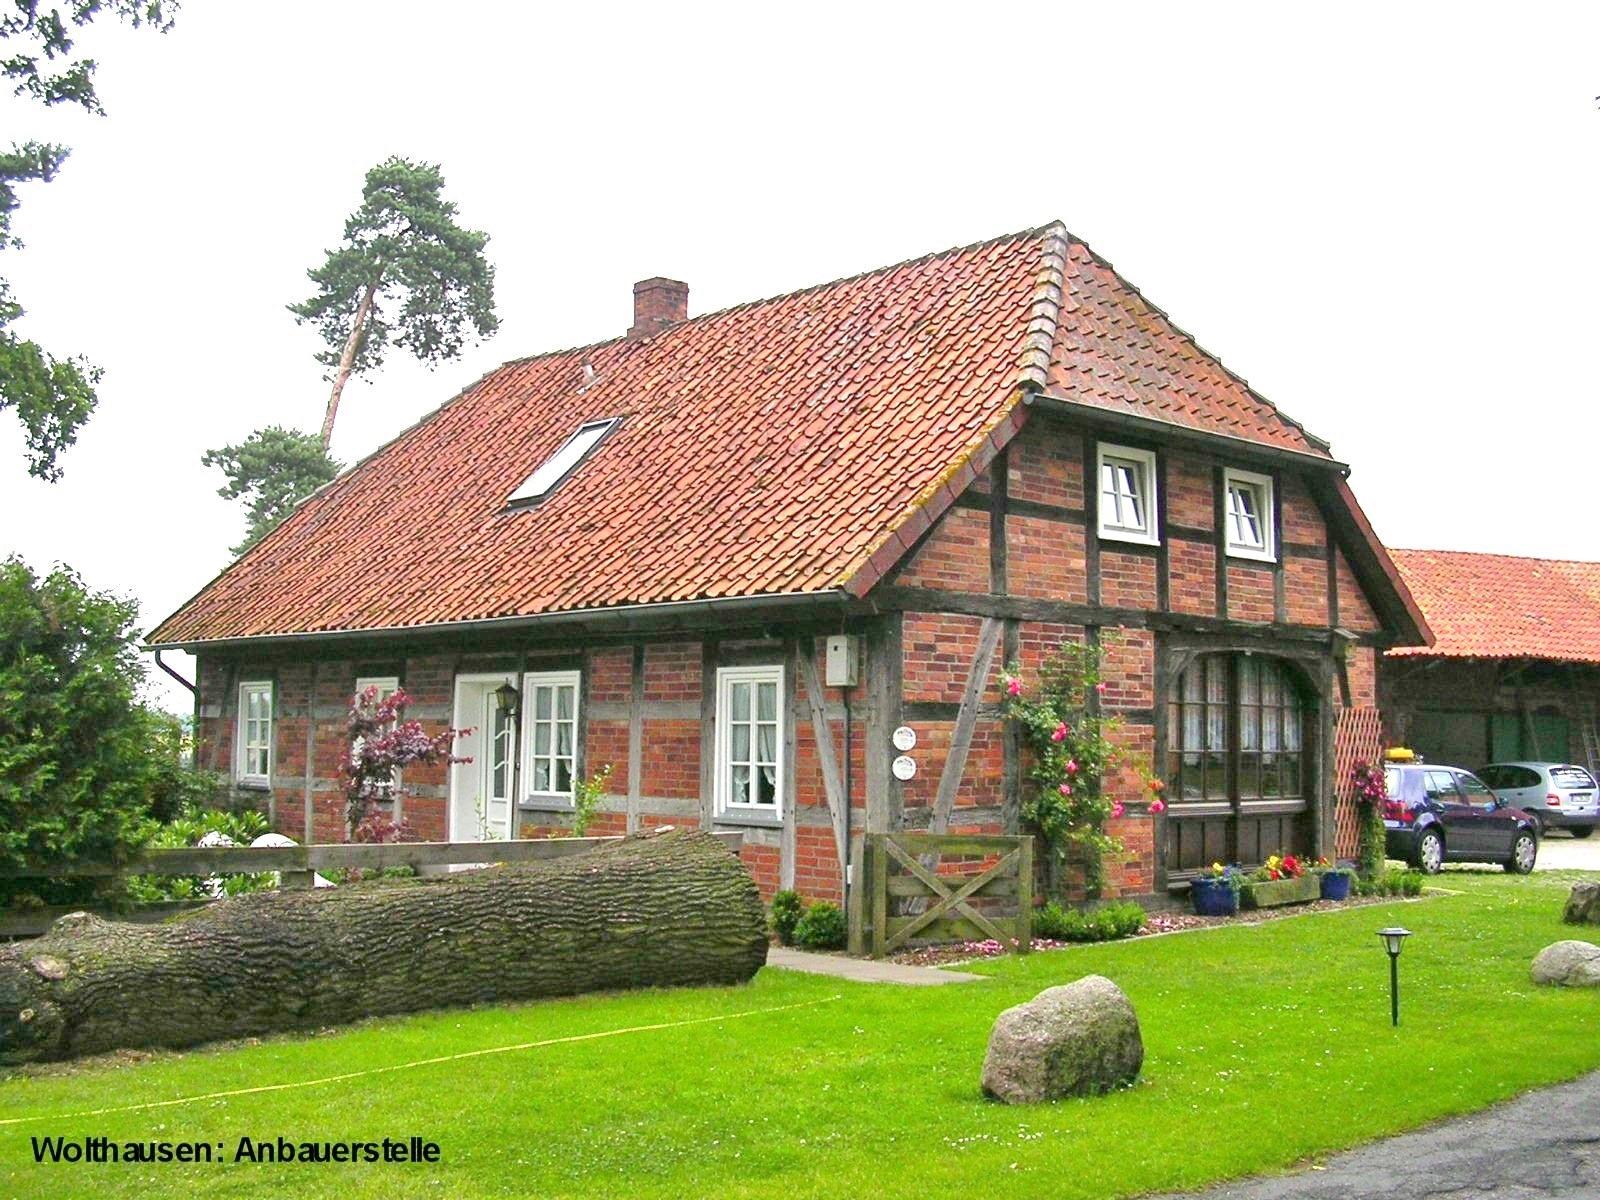 a-wolthausen-ce-anbauerstelle